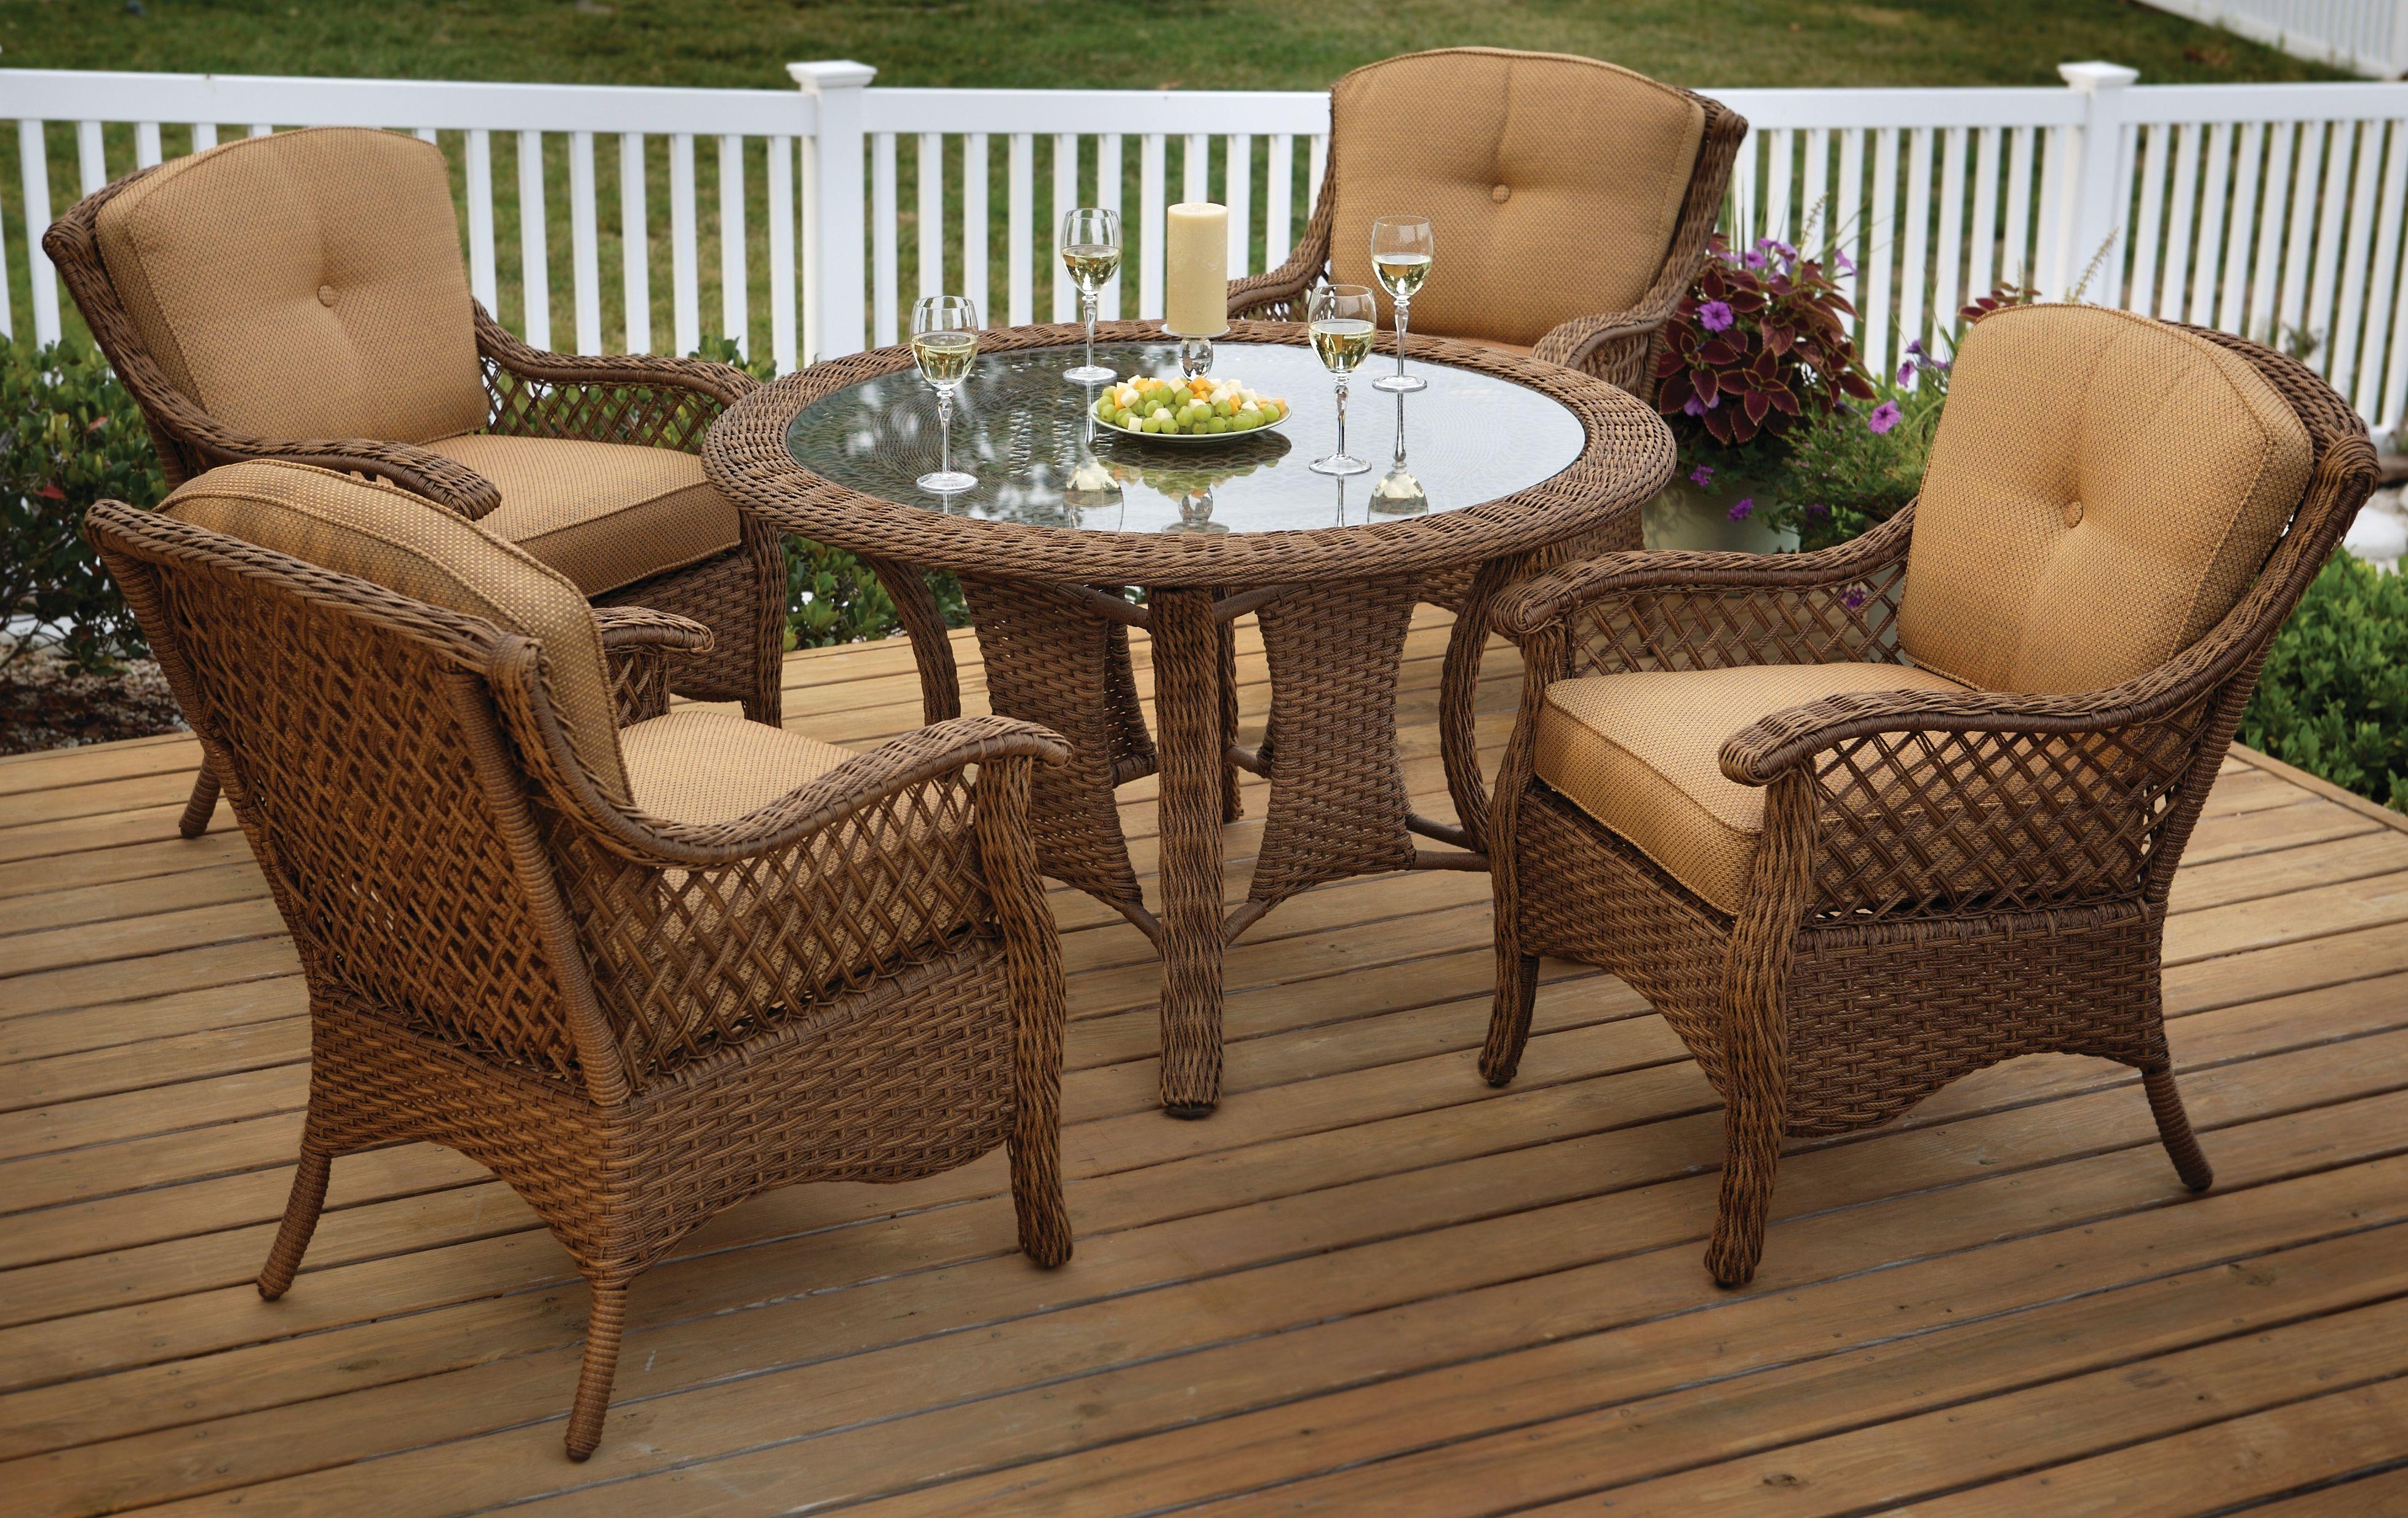 High Quality Wicker Patio Furniture: Energy Center Manhattan Pool 528 Pillsbury Drive  Manhattan, KS 66502